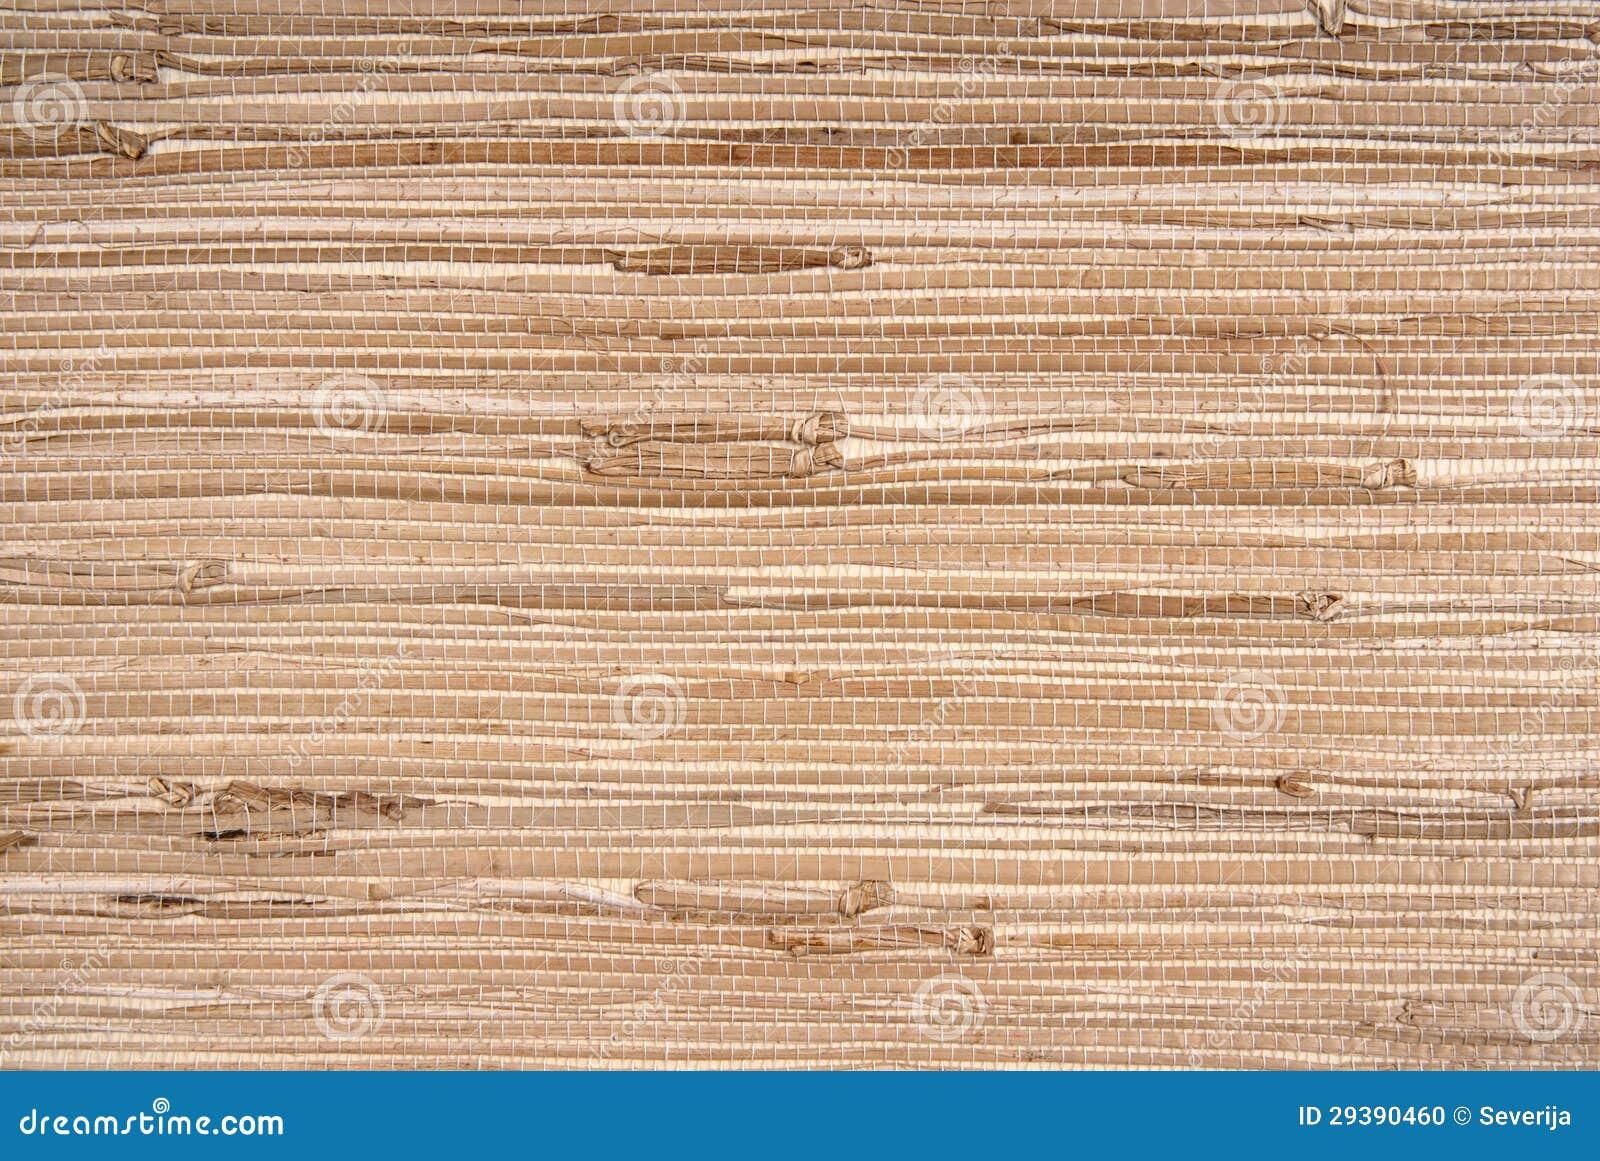 texture de tissu d 39 herbe de papier peint photo stock. Black Bedroom Furniture Sets. Home Design Ideas